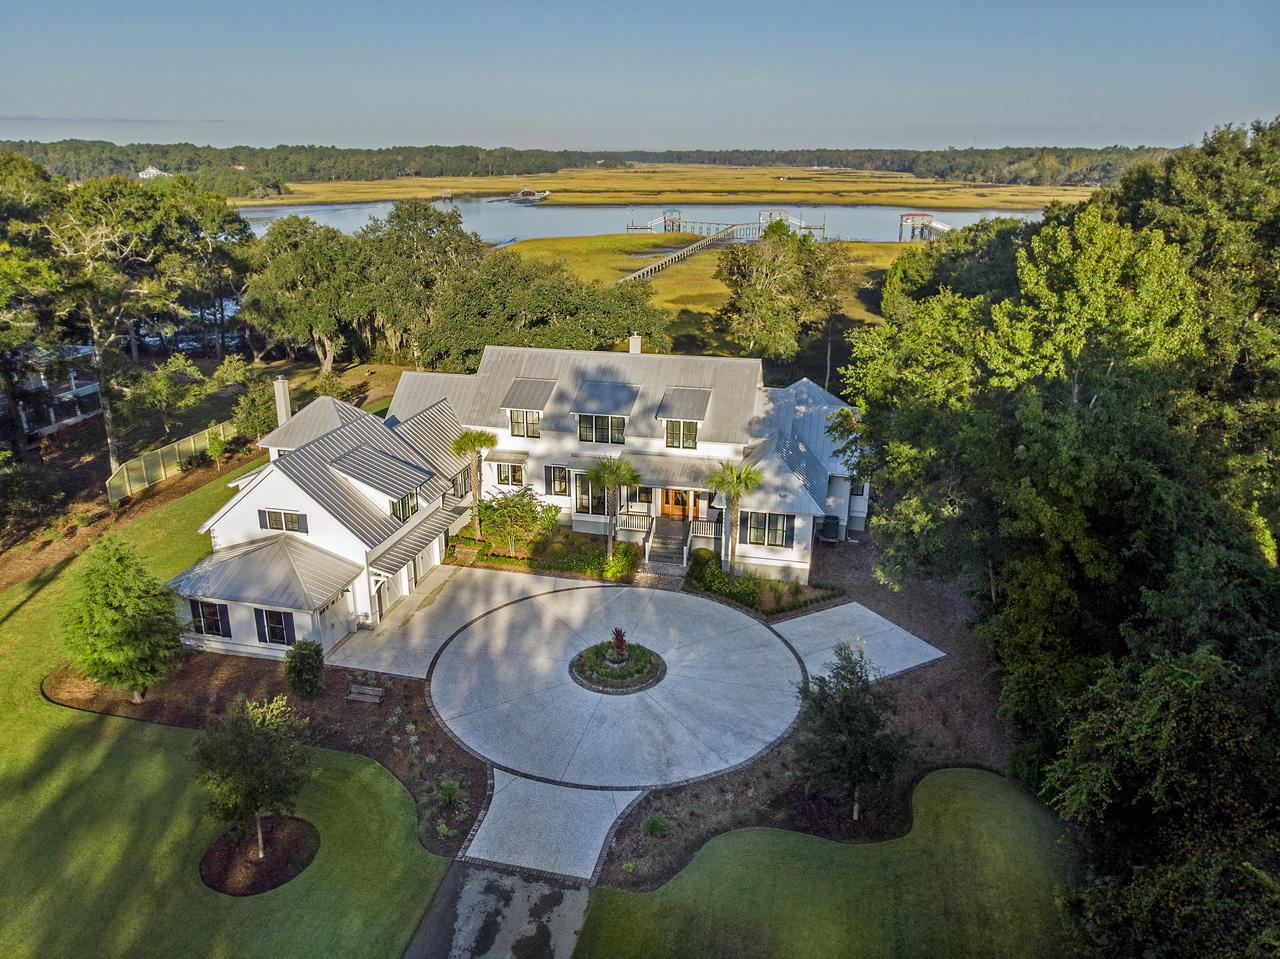 Johns Island Homes For Sale - 3977 Seaboard, Johns Island, SC - 47